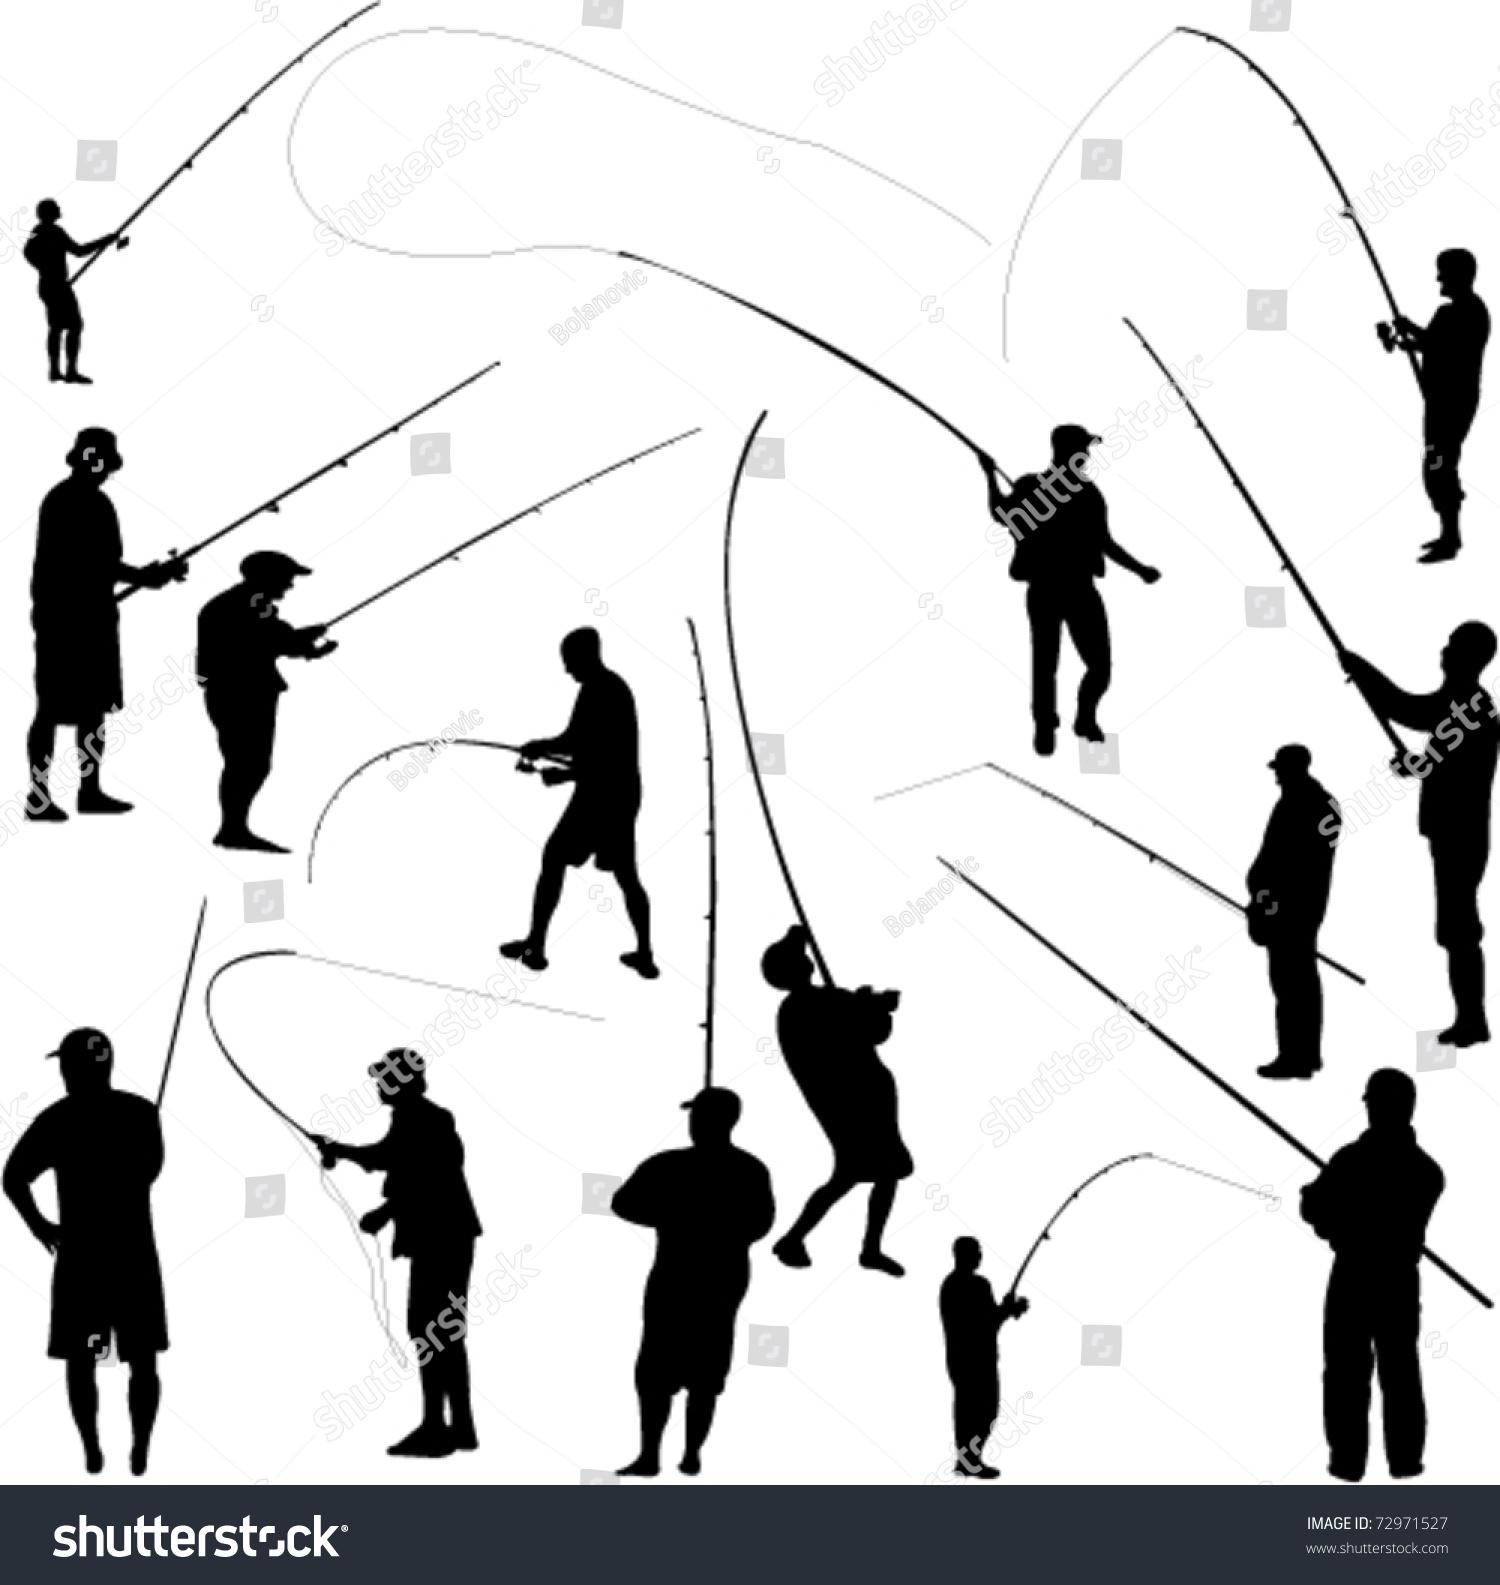 Fishermen Fishing Vector Stock Vector 72971527 - Shutterstock